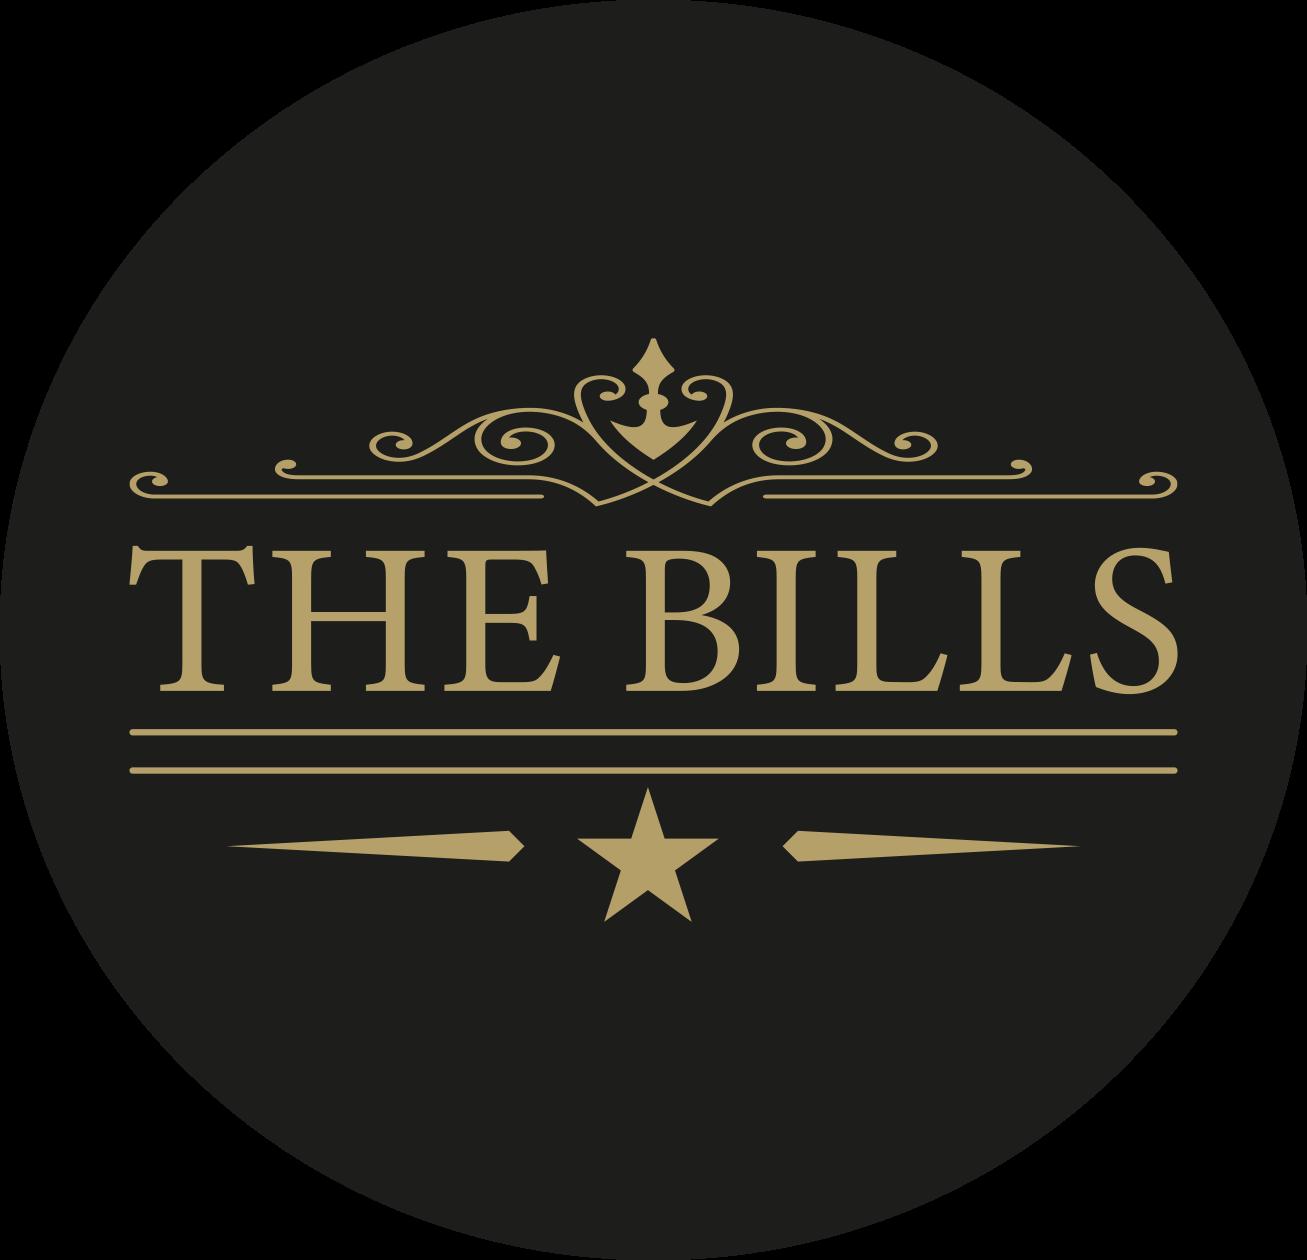 The Bills logo